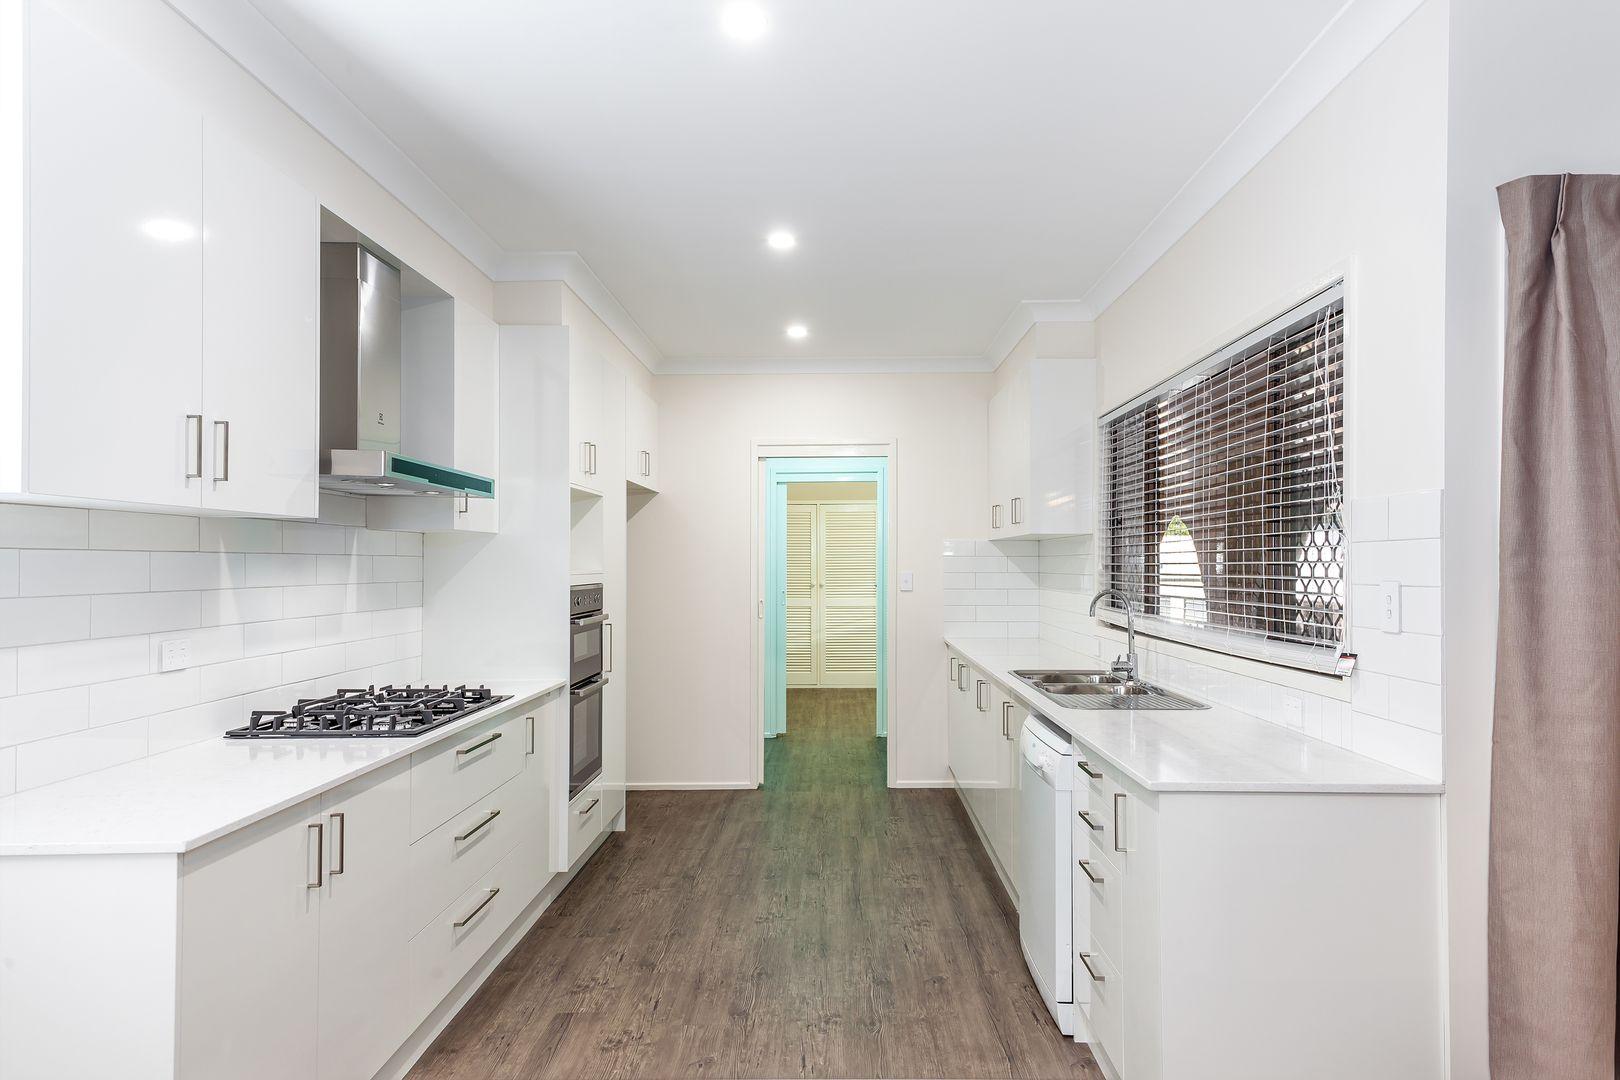 8 Kensington Drive, Withcott QLD 4352, Image 2